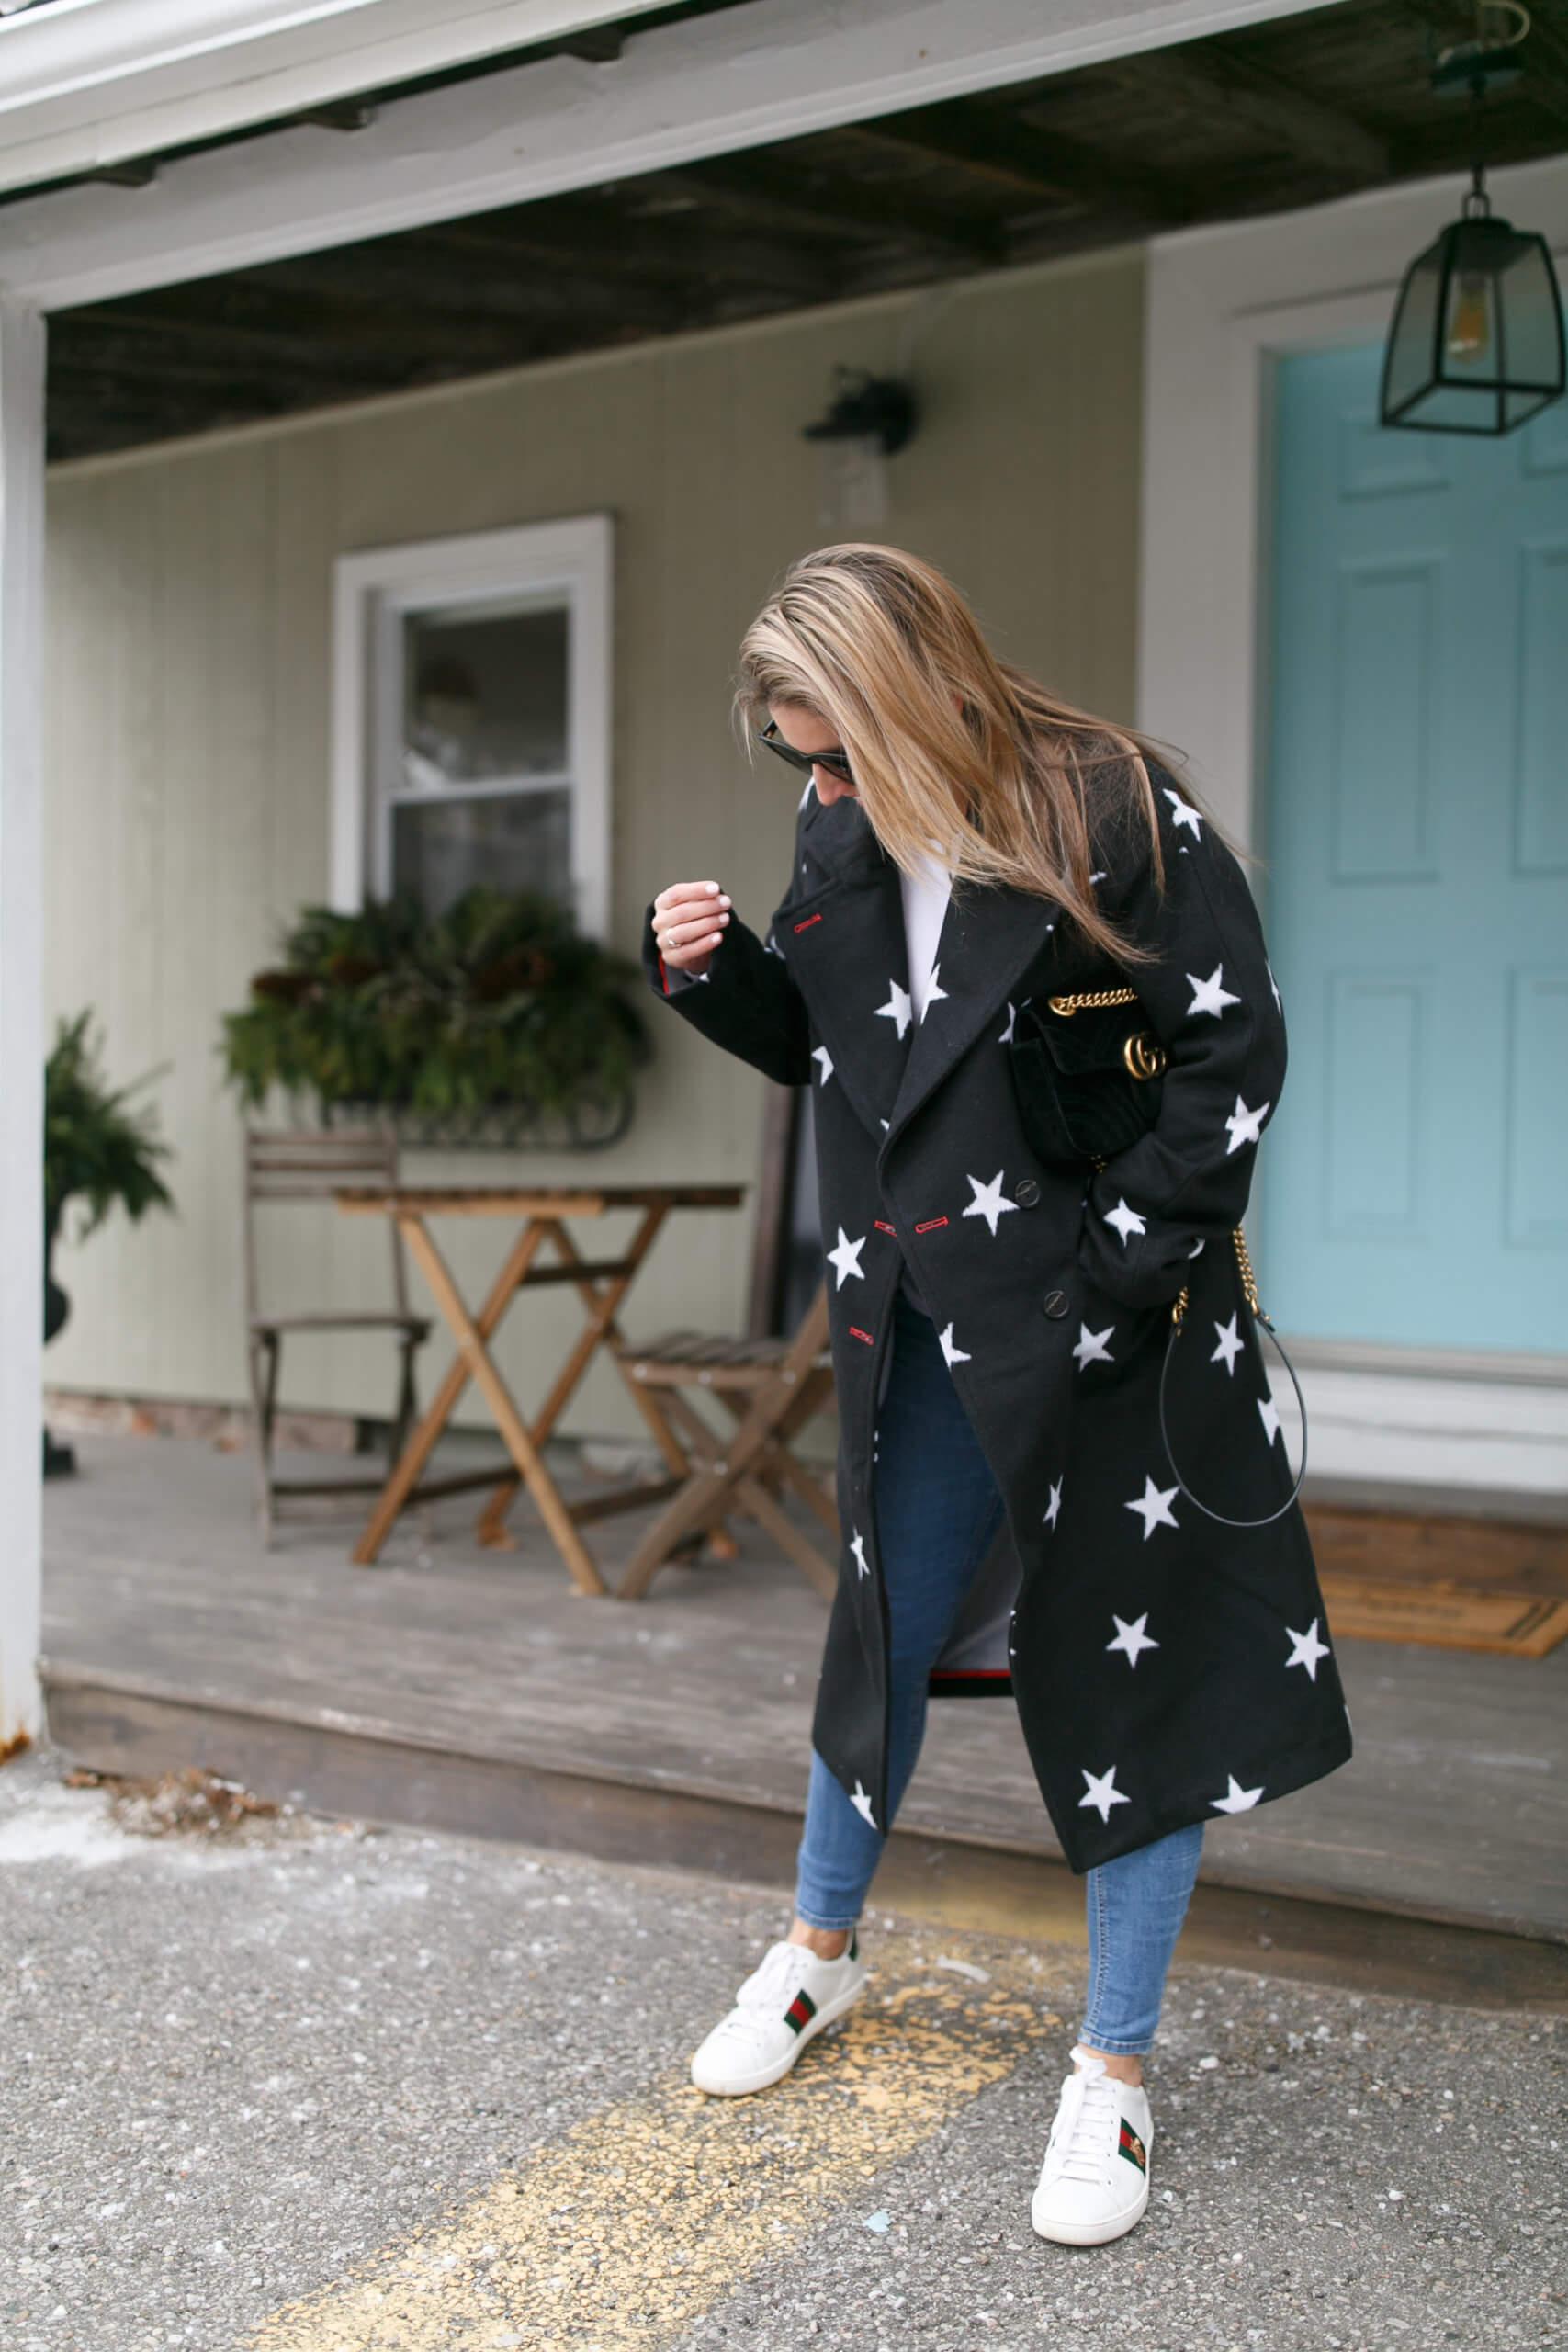 Avec Les Filles Star Coat; winter style sparkleshinylove  Mandy Furnis; Durham Region Blogger; Pretty Winter coats